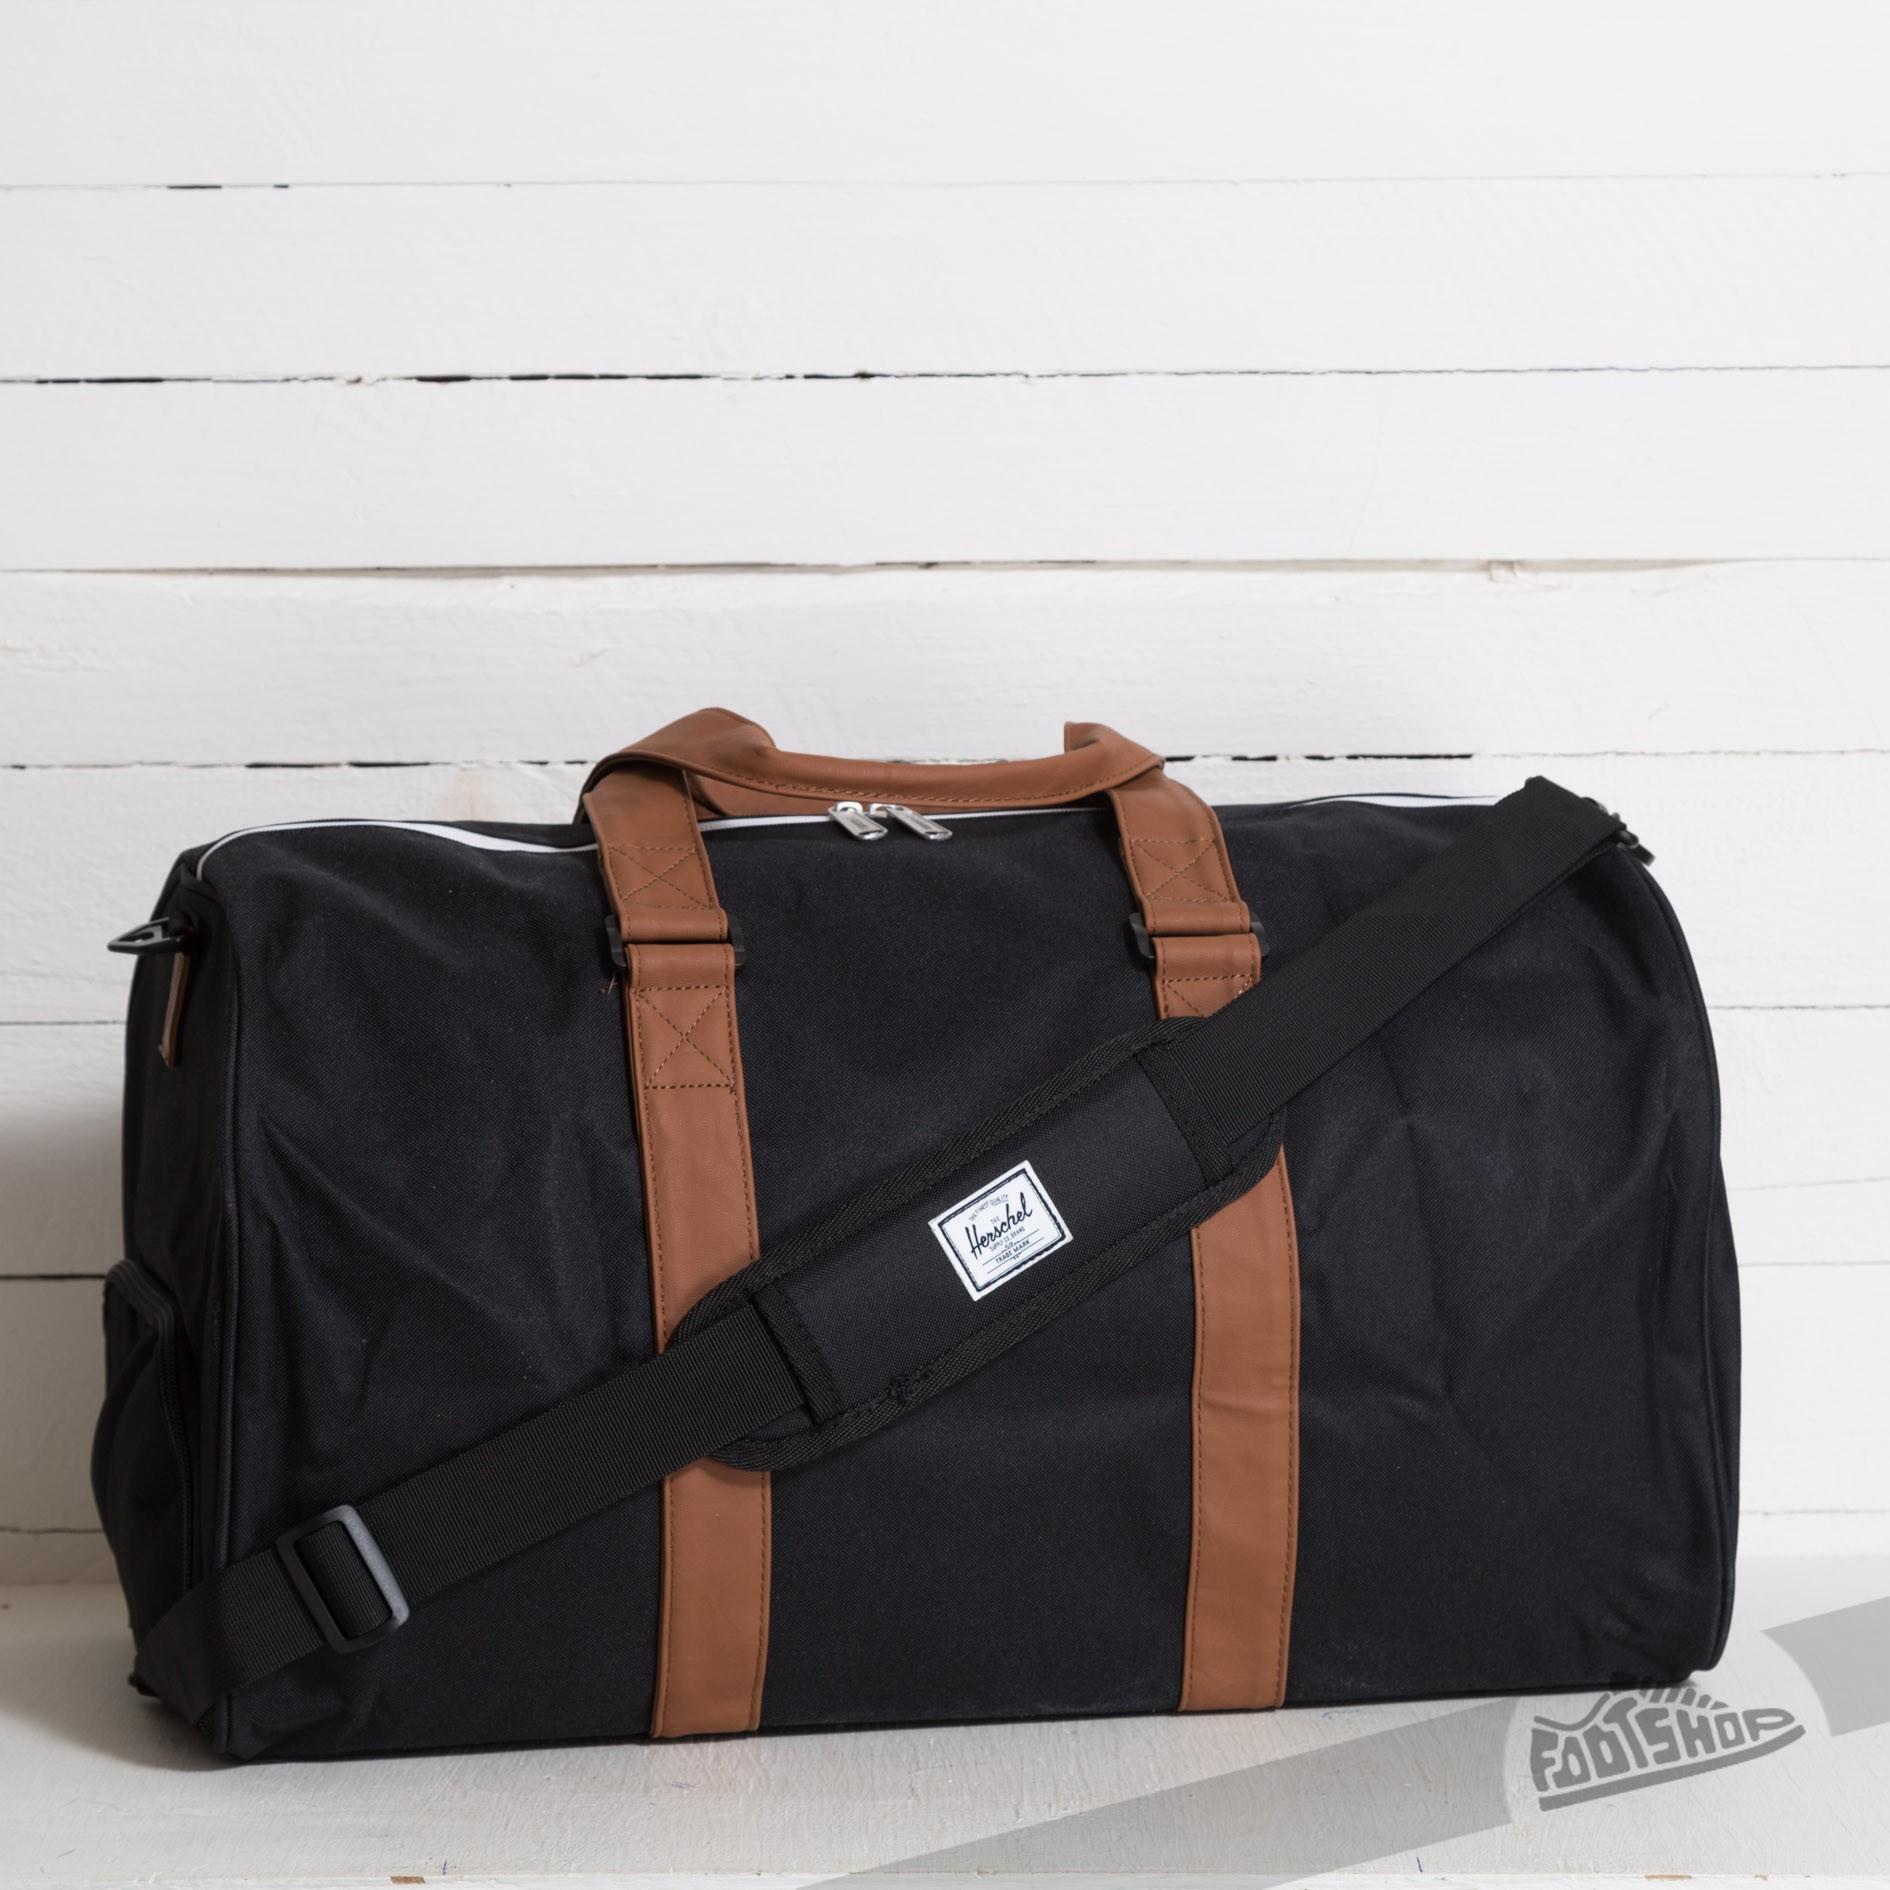 f438d8bb776ec Herschel Supply Co. Novel Duffle Black Tan